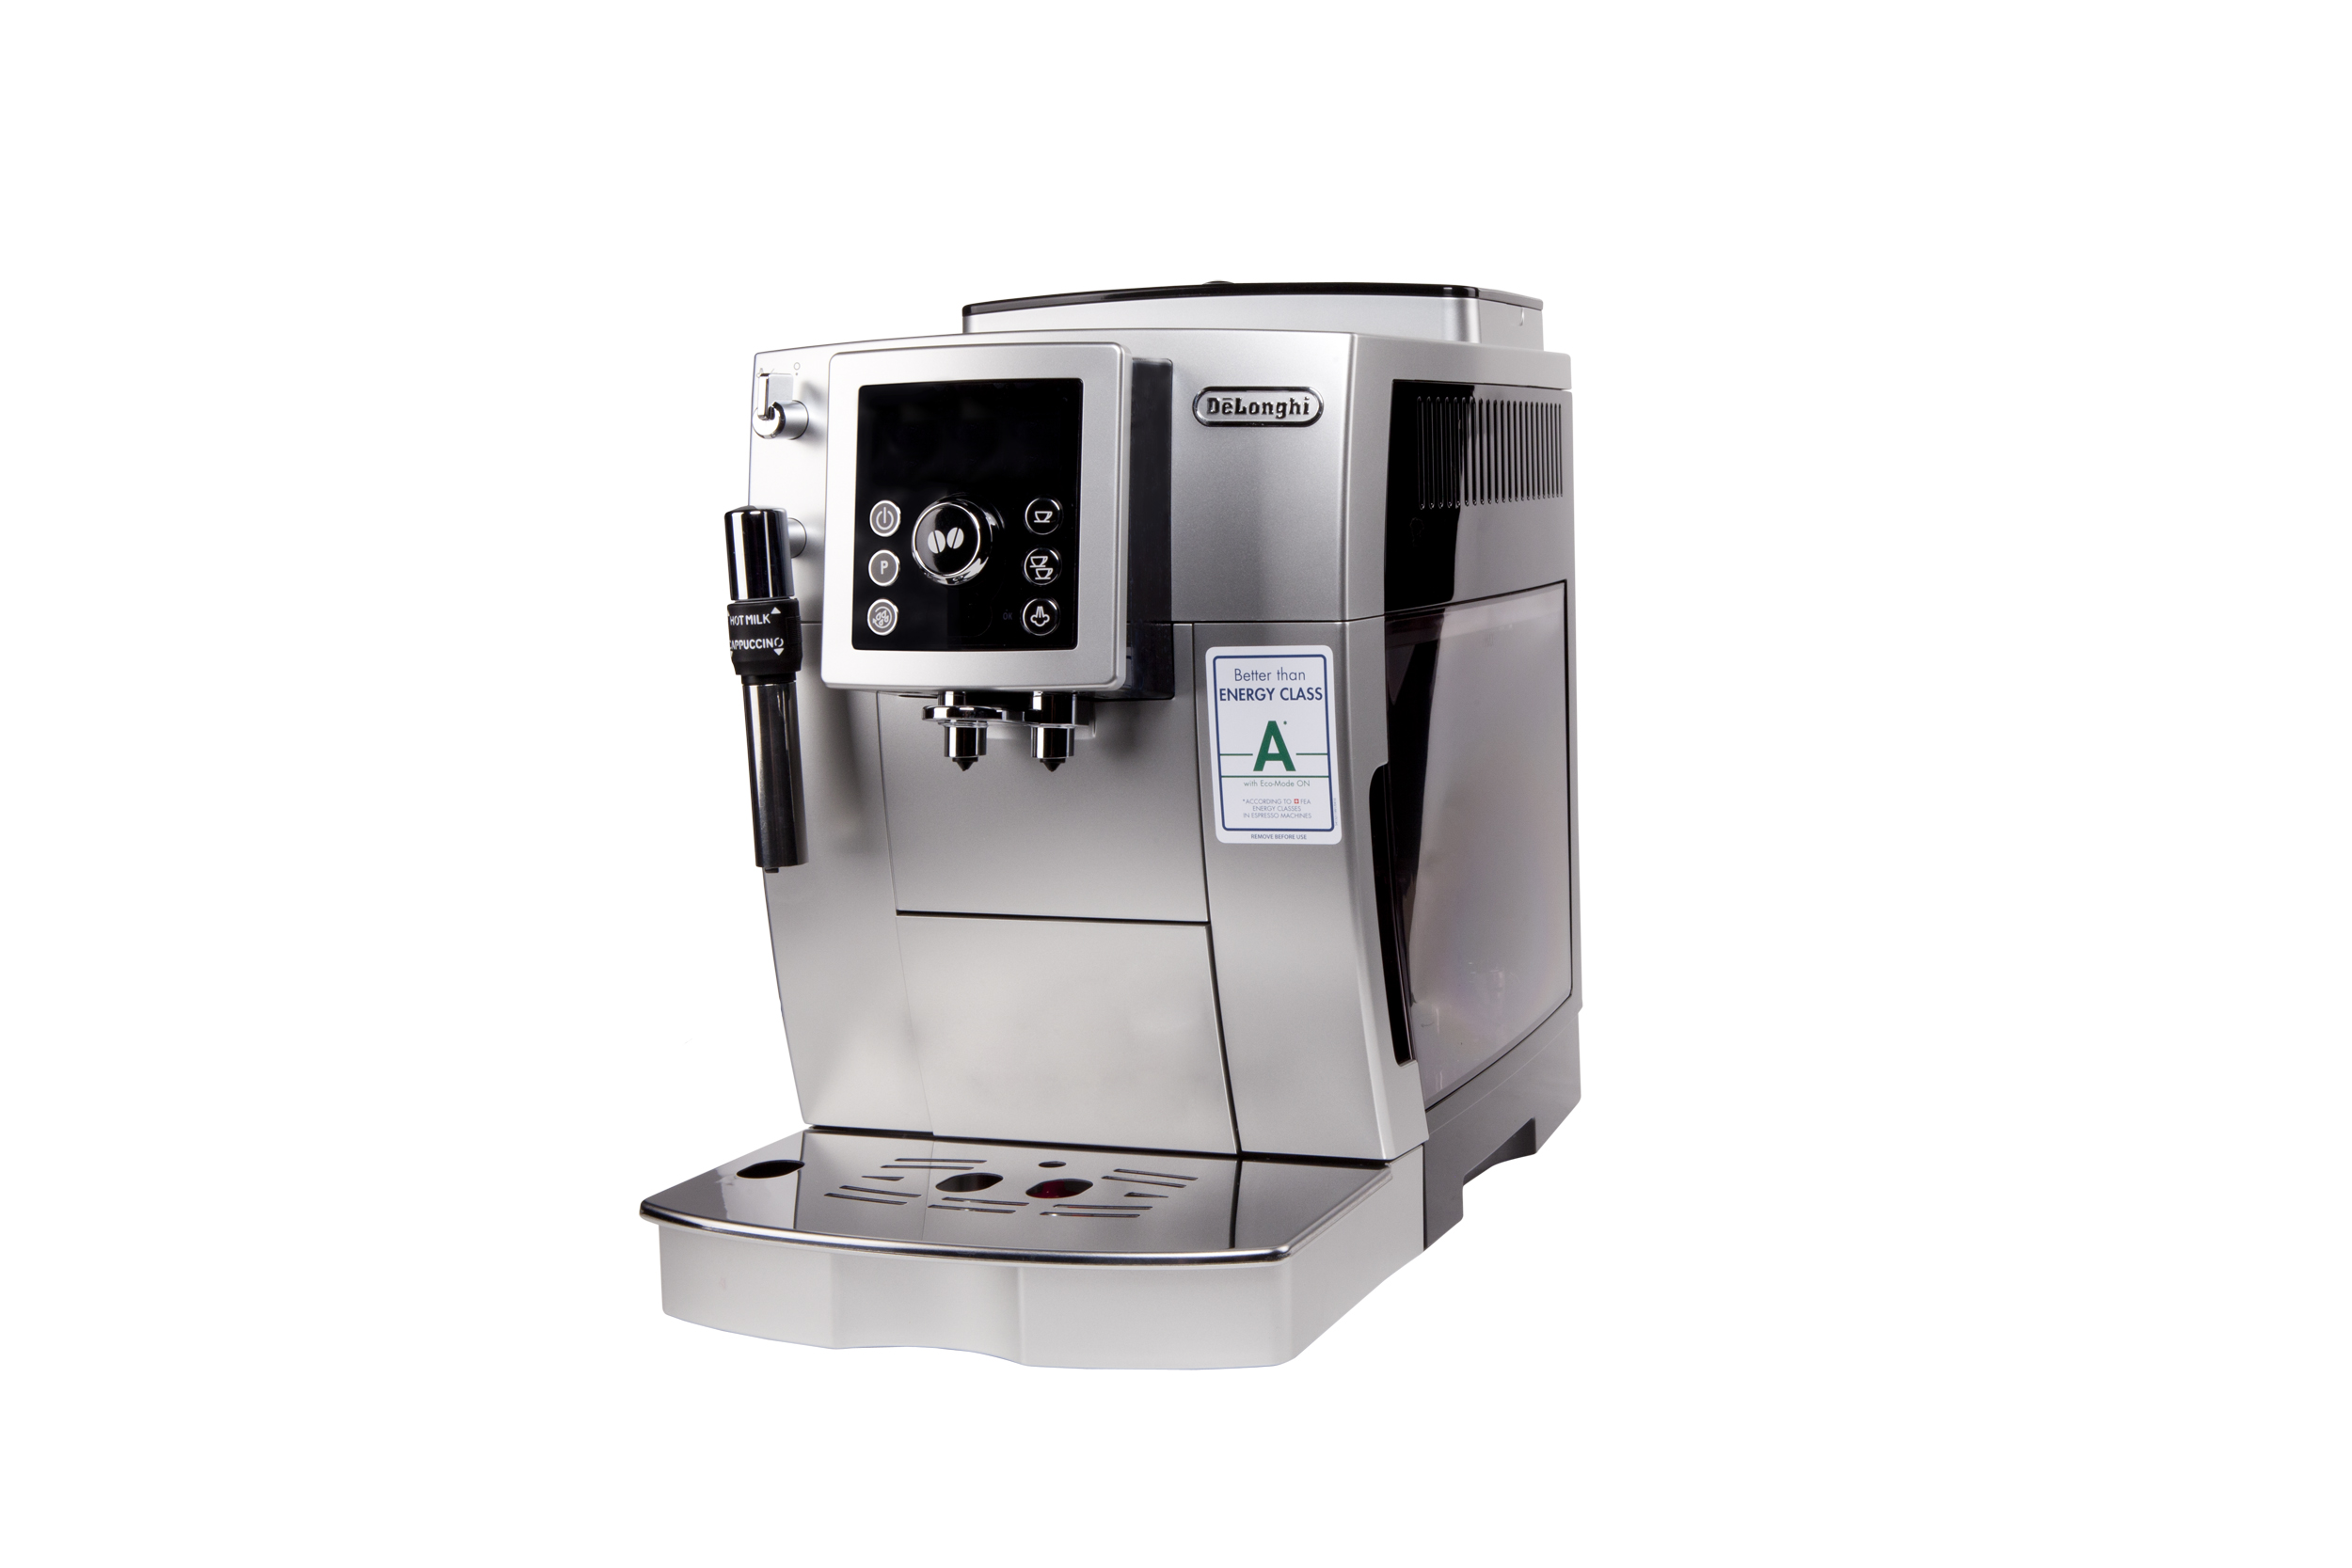 delongi kaffeevollautomat cappuccino cafe espresso kaffeemaschine silber schwarz ebay. Black Bedroom Furniture Sets. Home Design Ideas